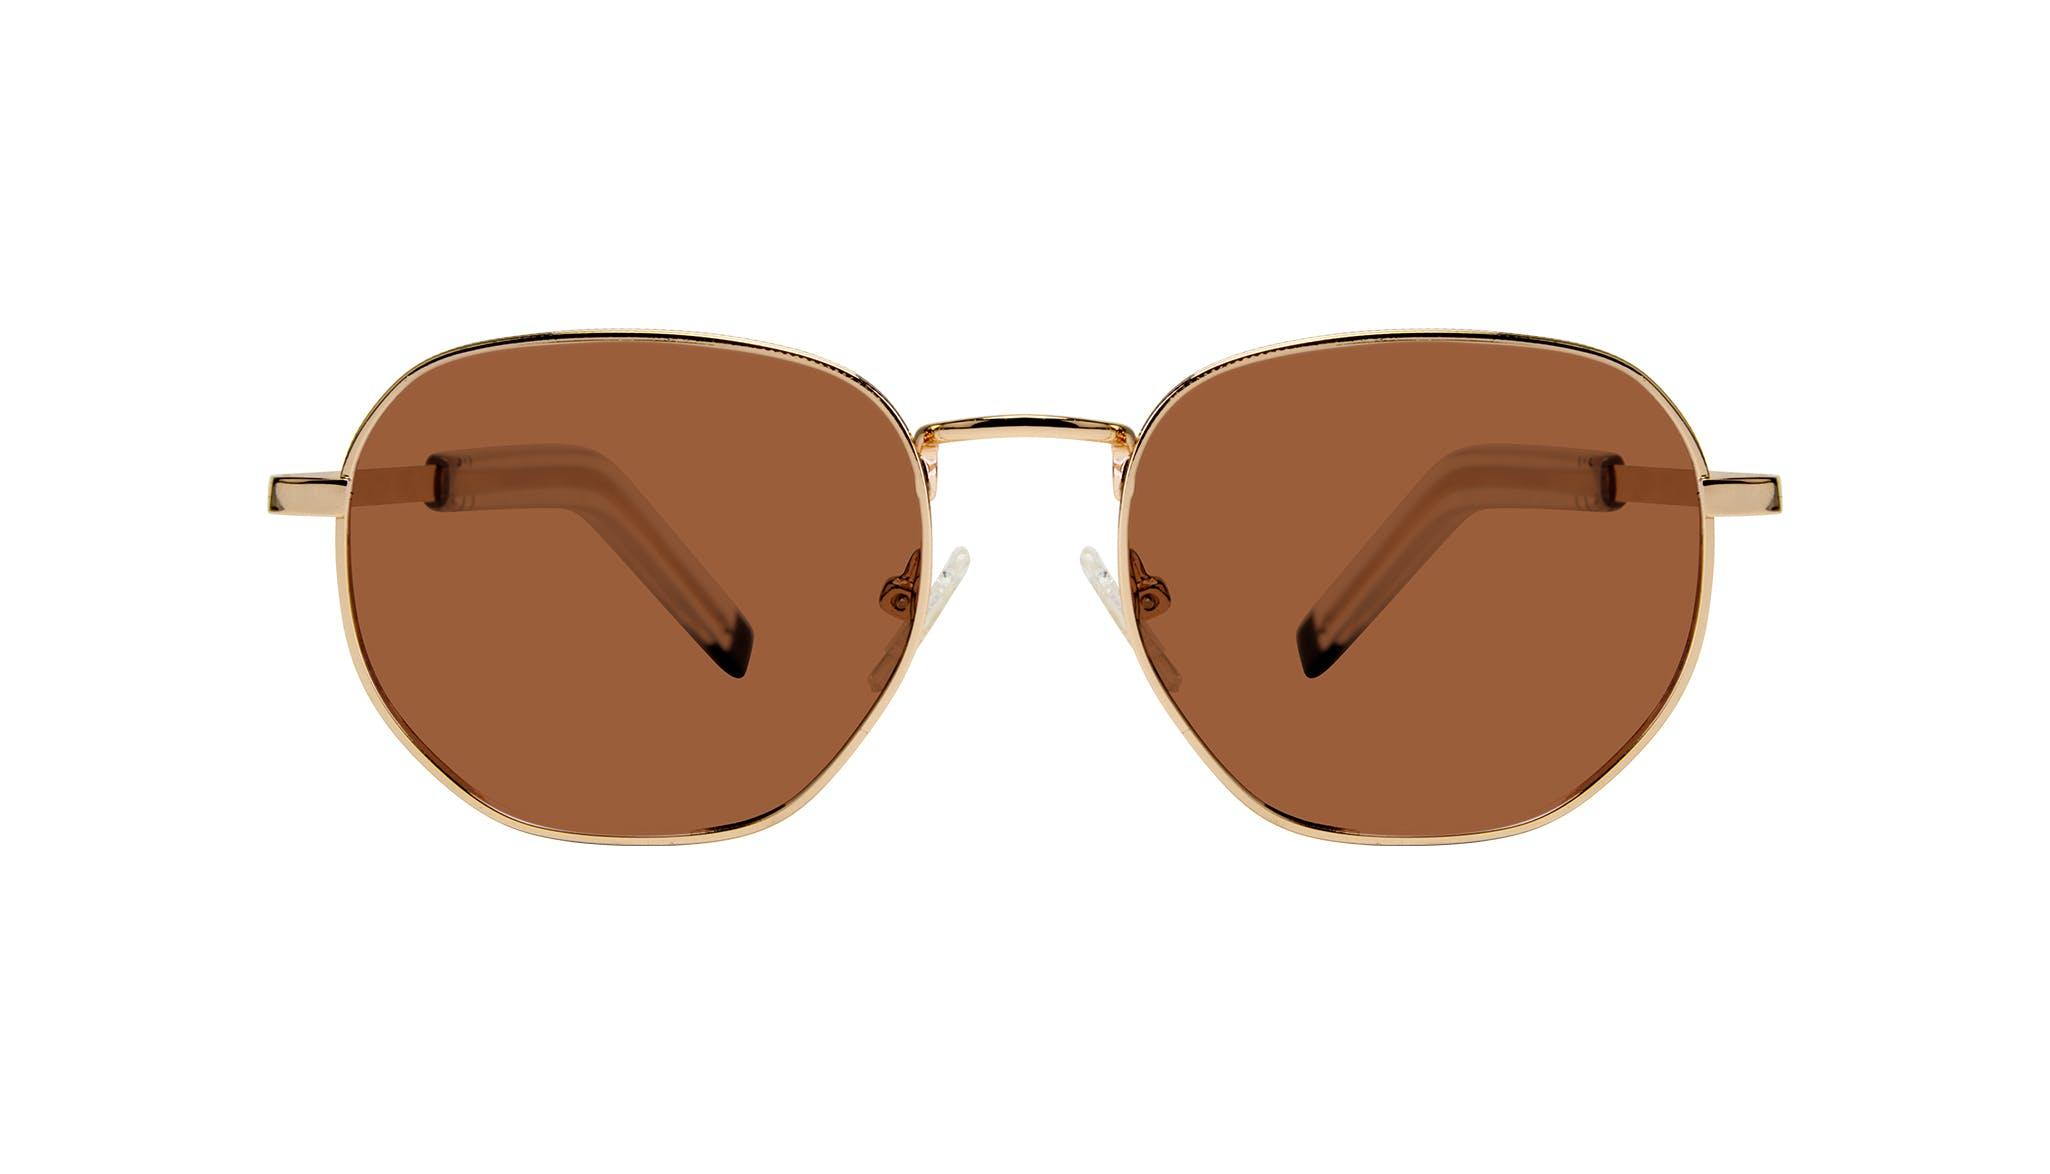 Affordable Fashion Glasses Round Sunglasses Men Rise Gold